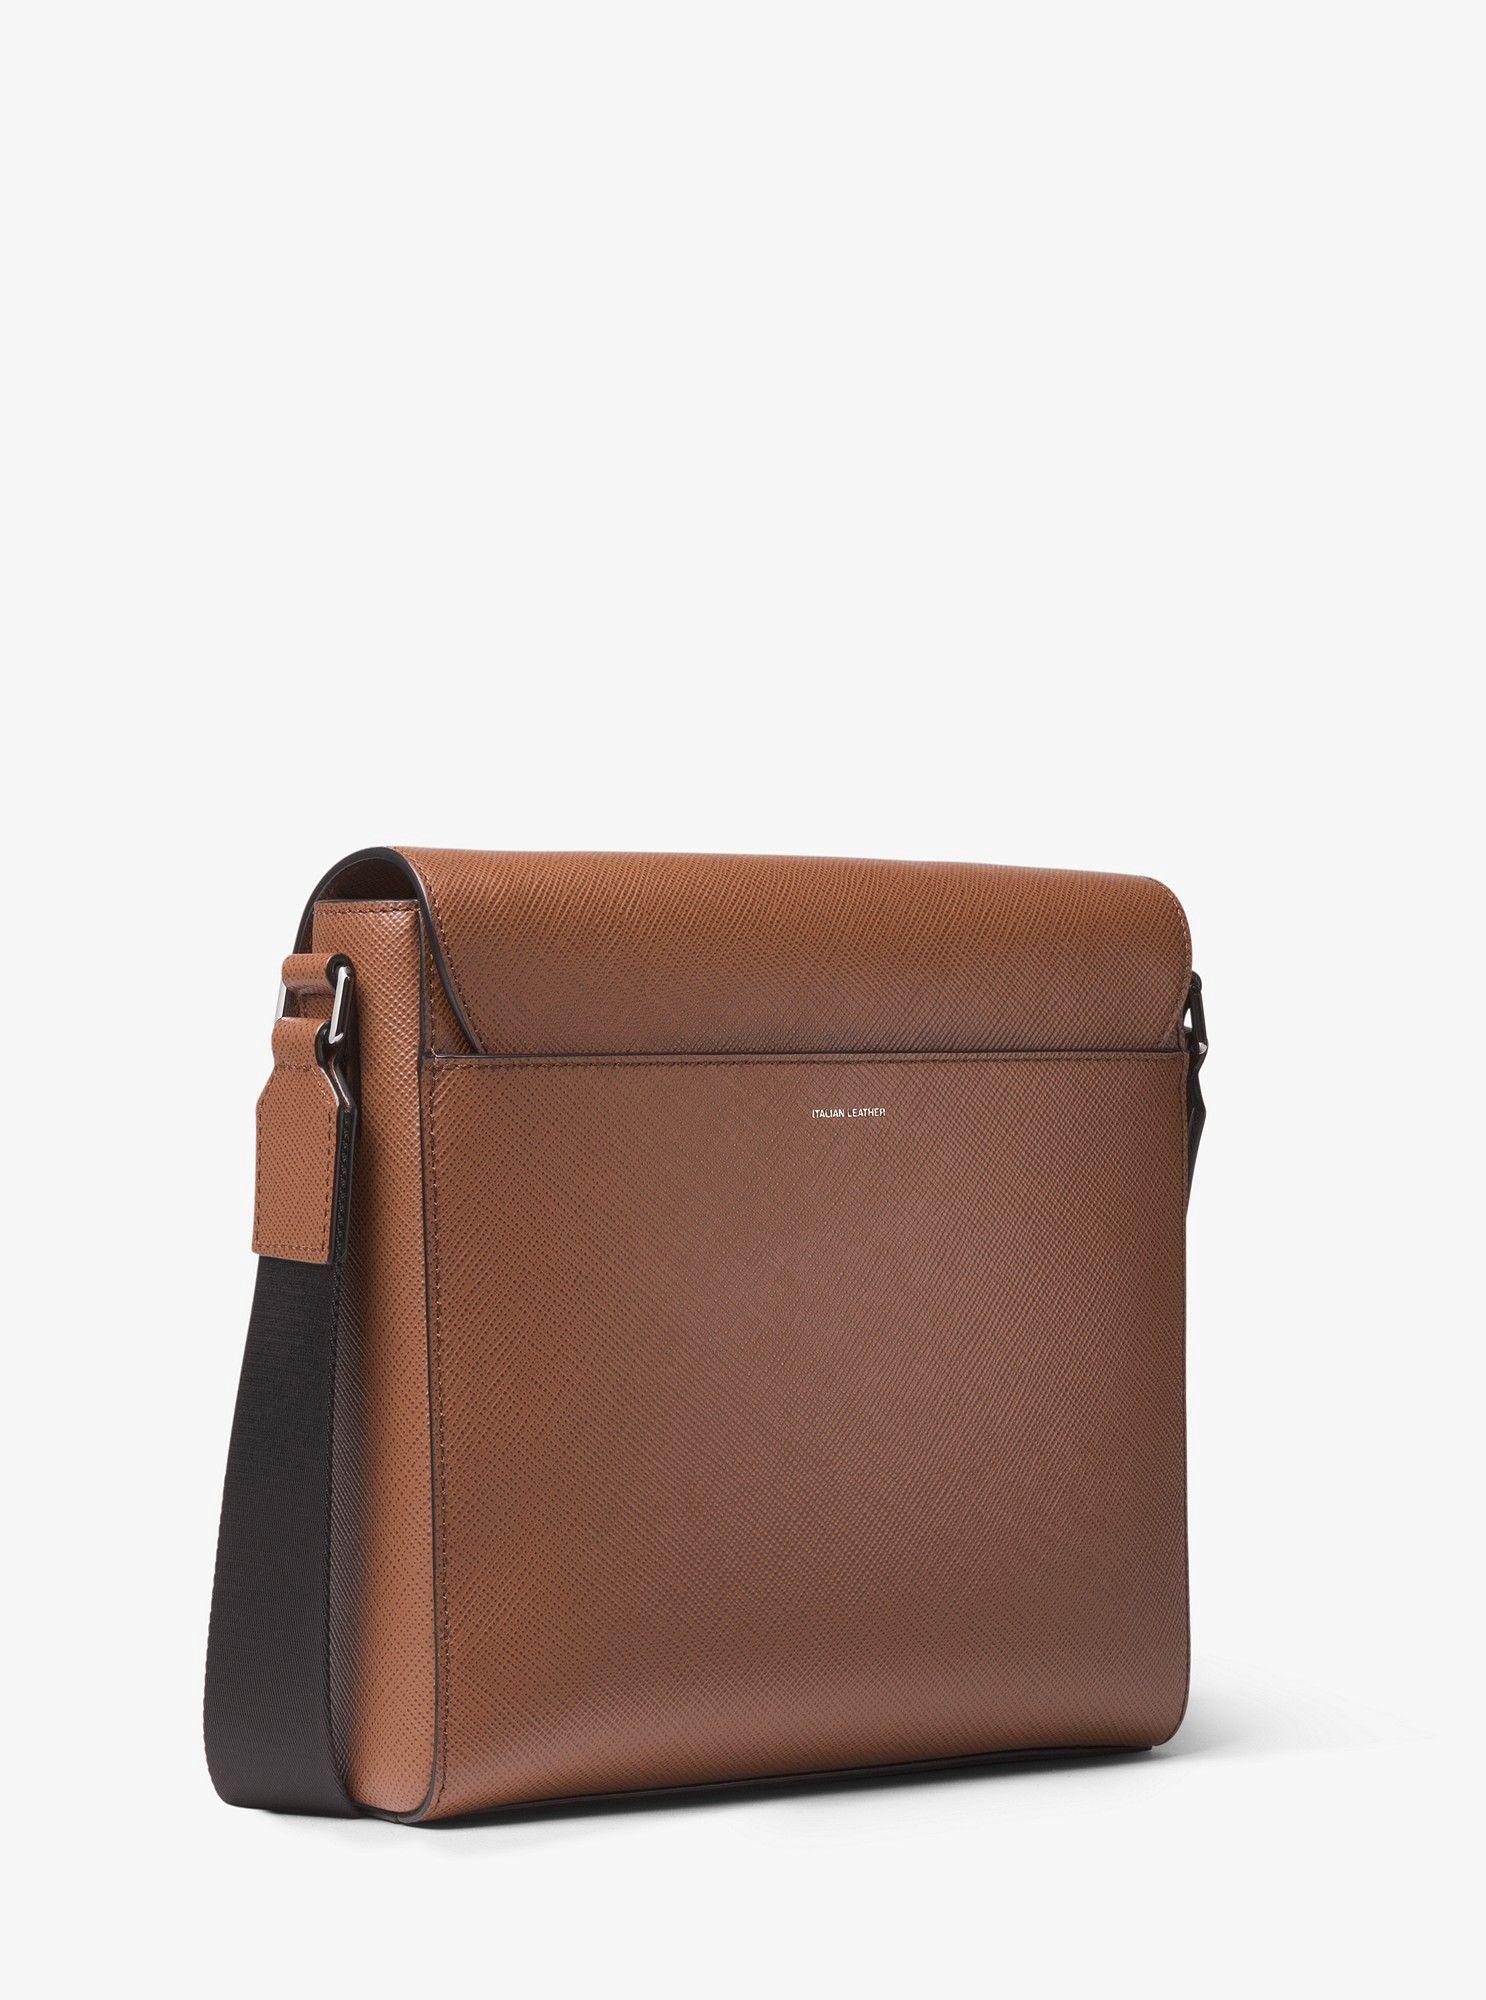 5e71a28e59489d Michael Kors Harrison Medium Leather Messenger Bag - Luggage ...